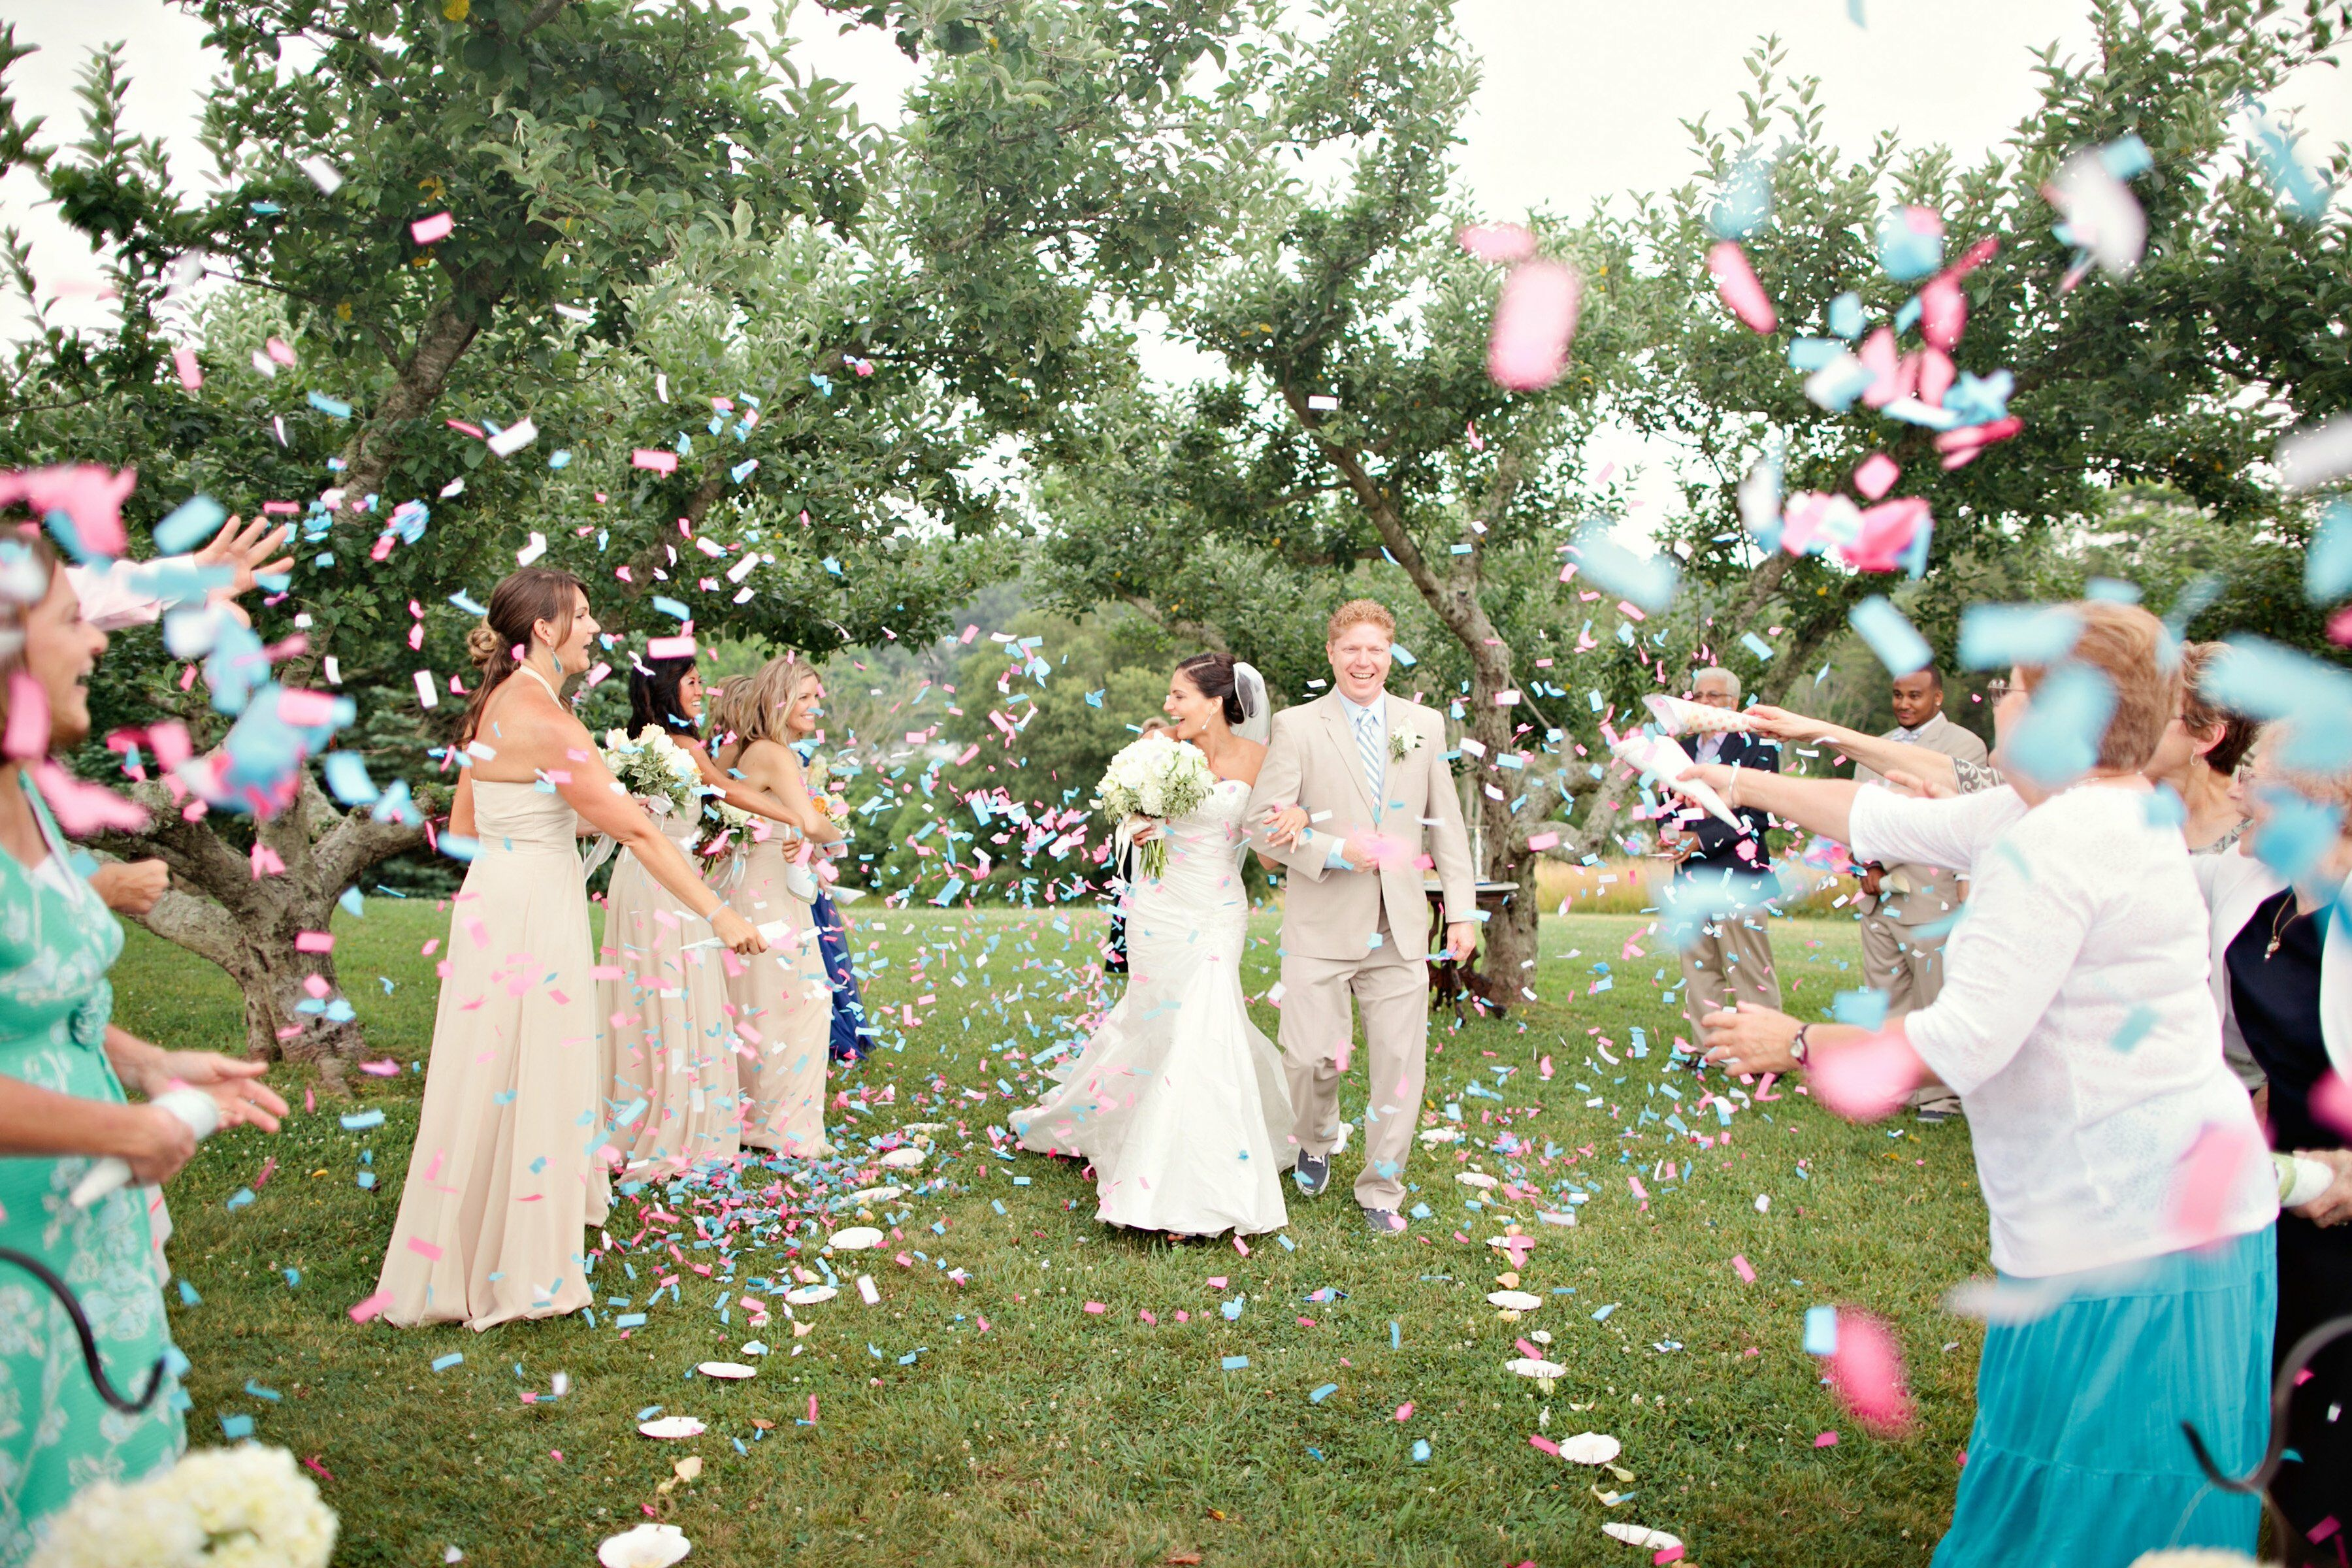 an authentic casual wedding in falmouth ma album wedding send off ideas